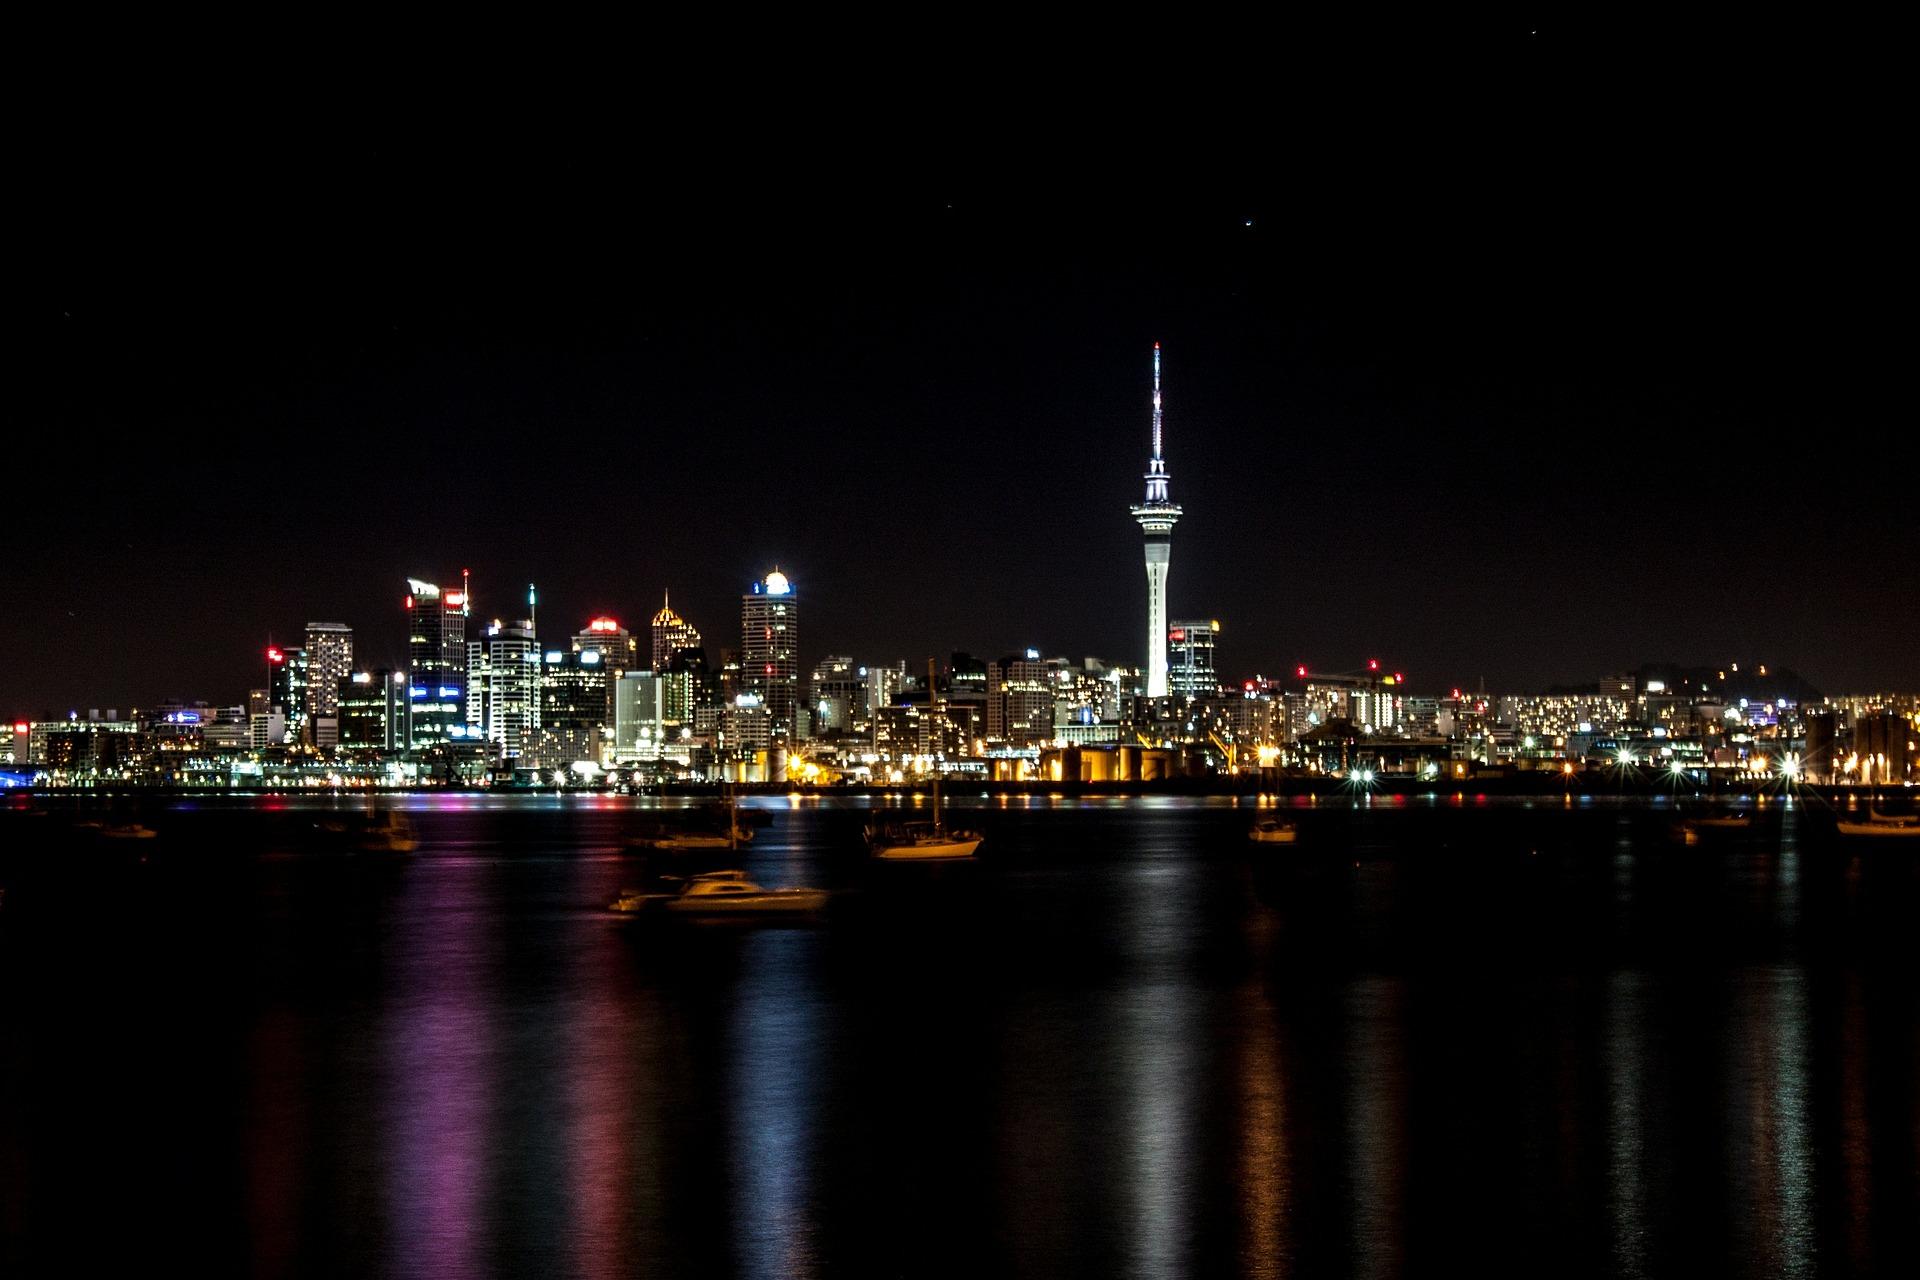 Auckland-sky-tower-landscape